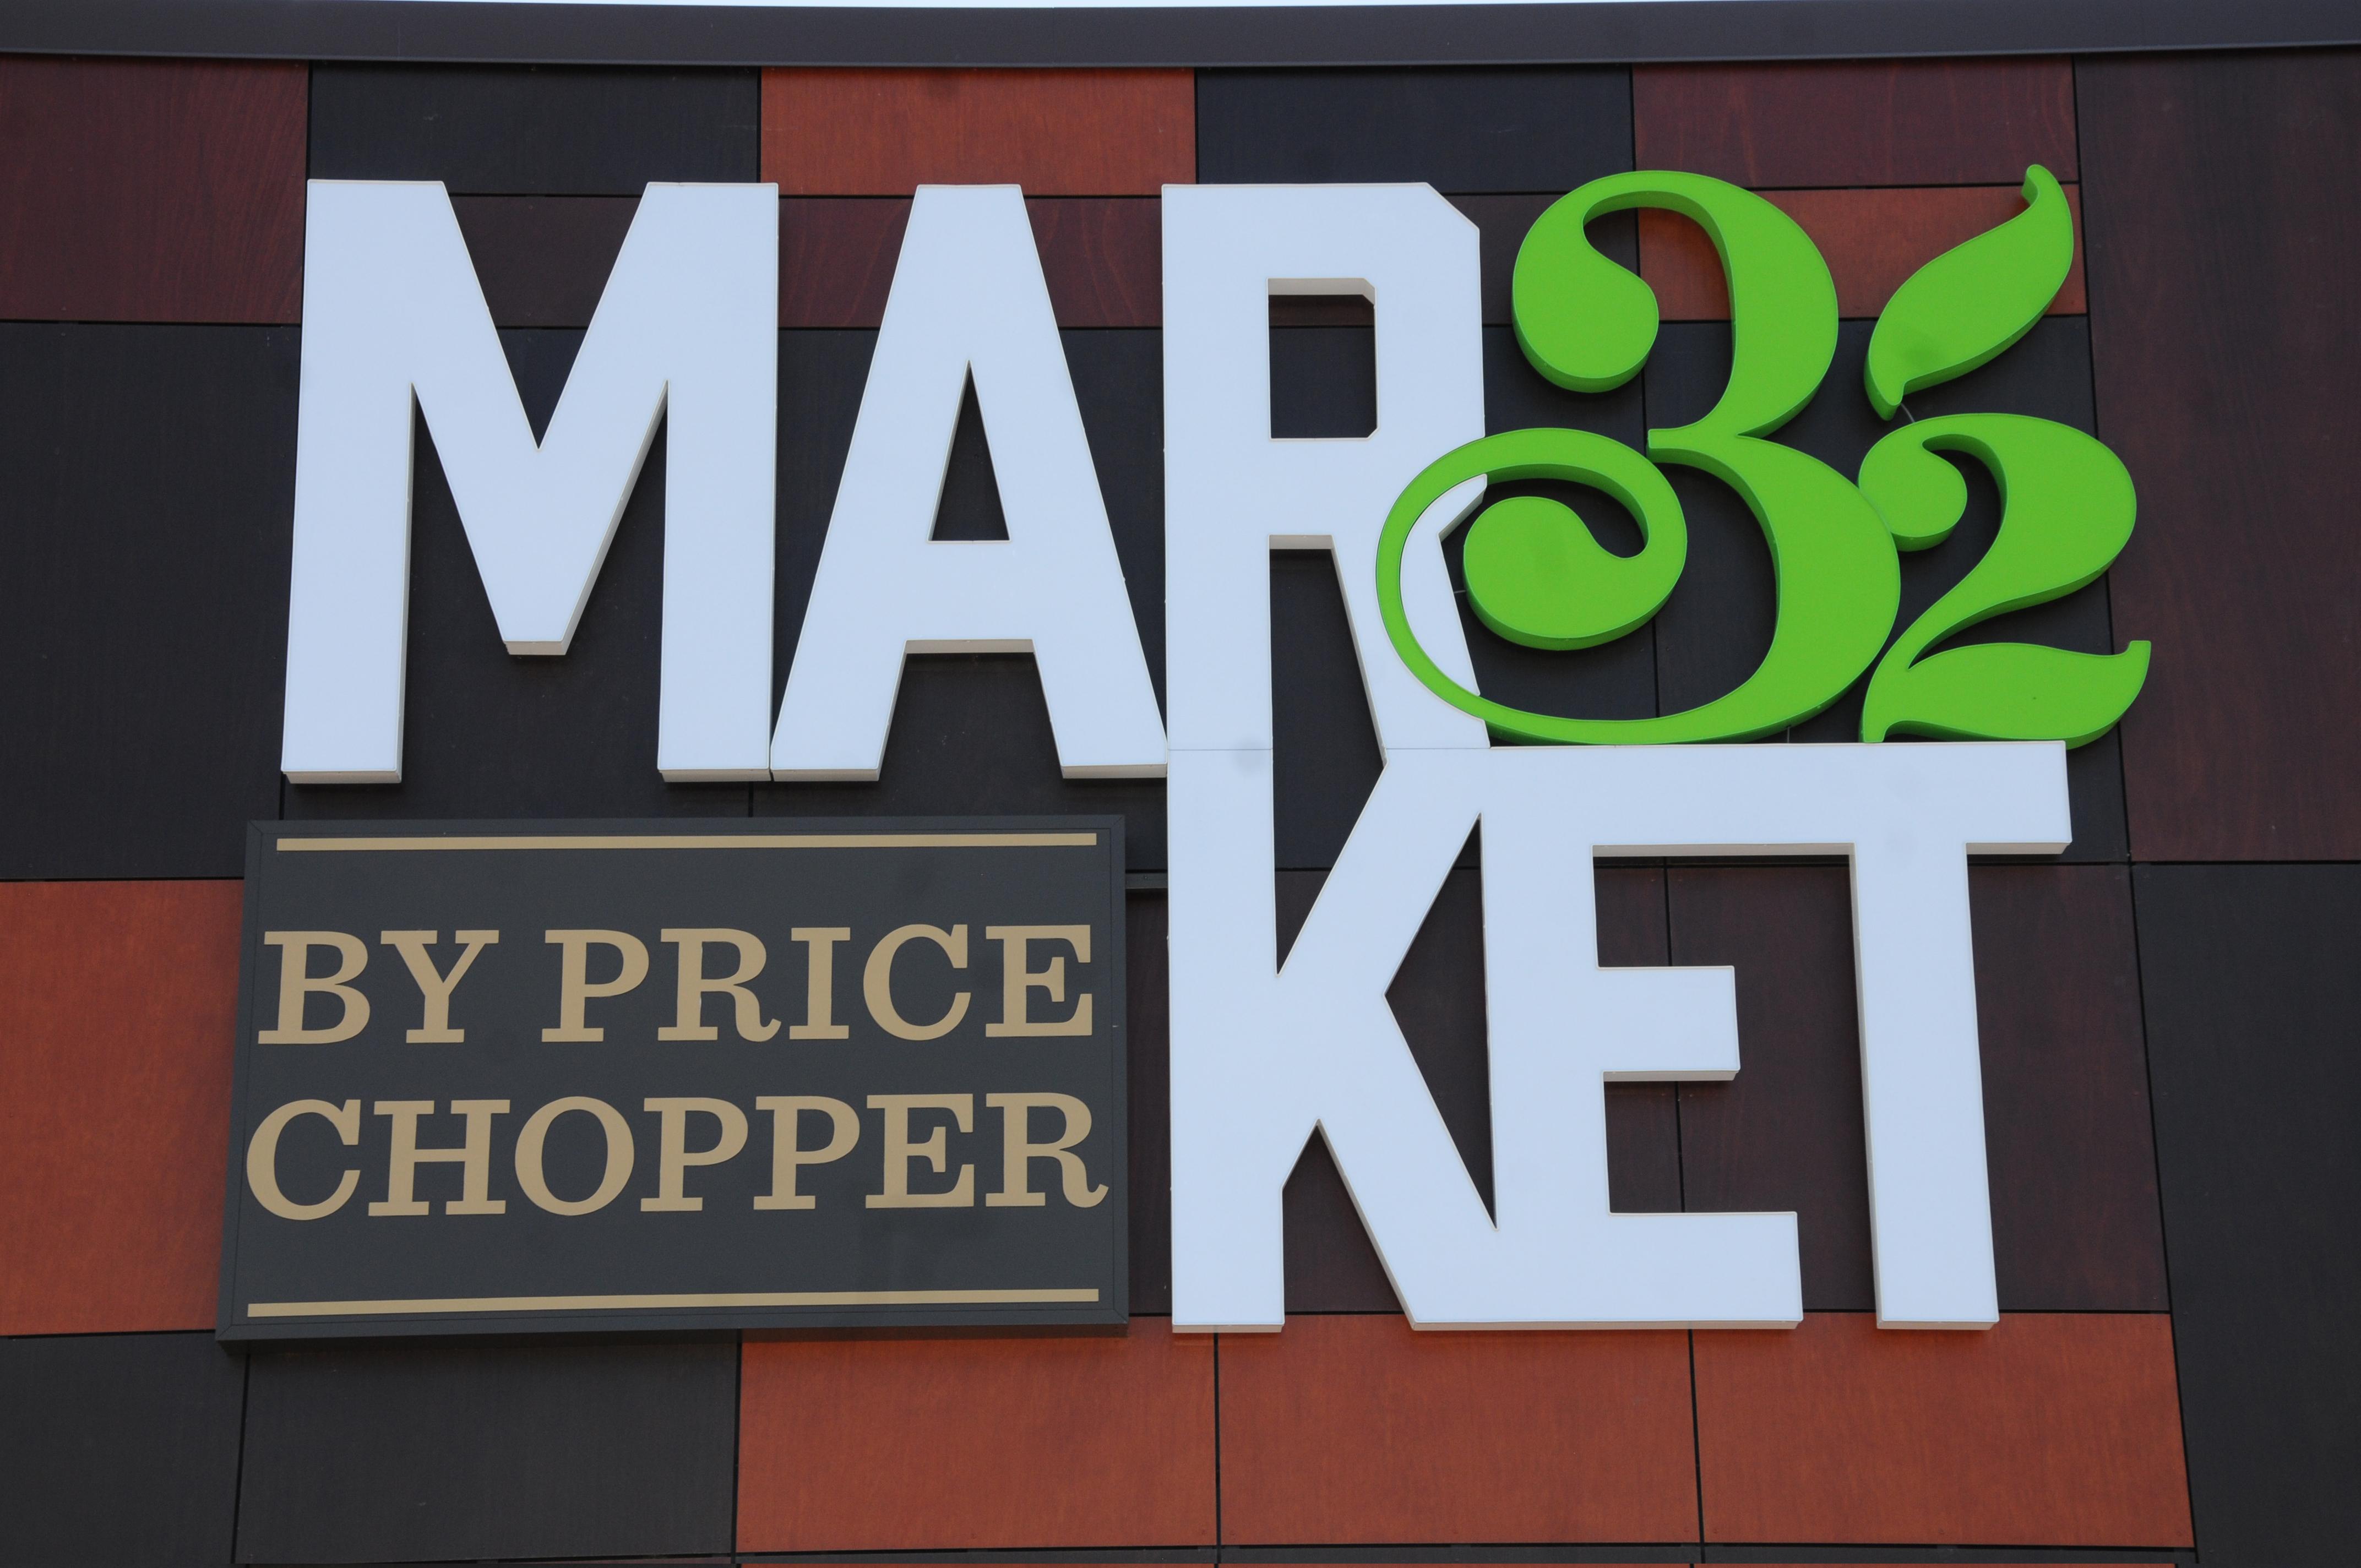 market32a.jpg